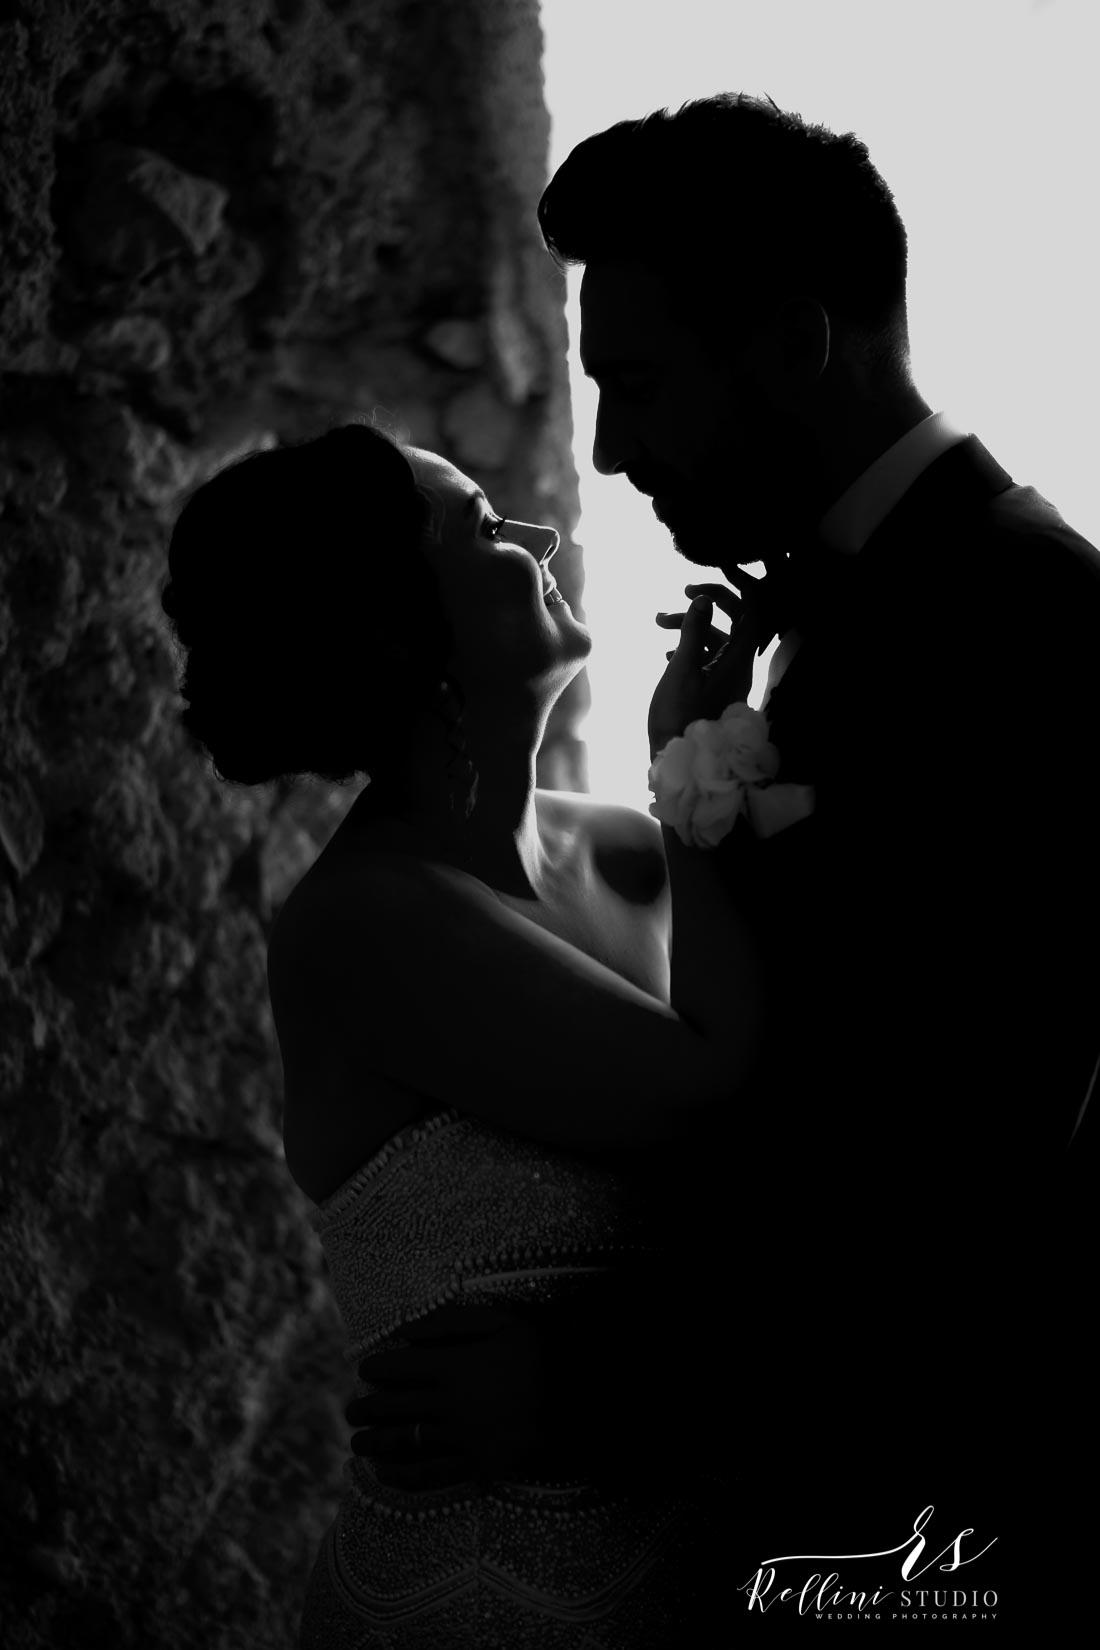 Rellini art studio, destination wedding photographers in Italy